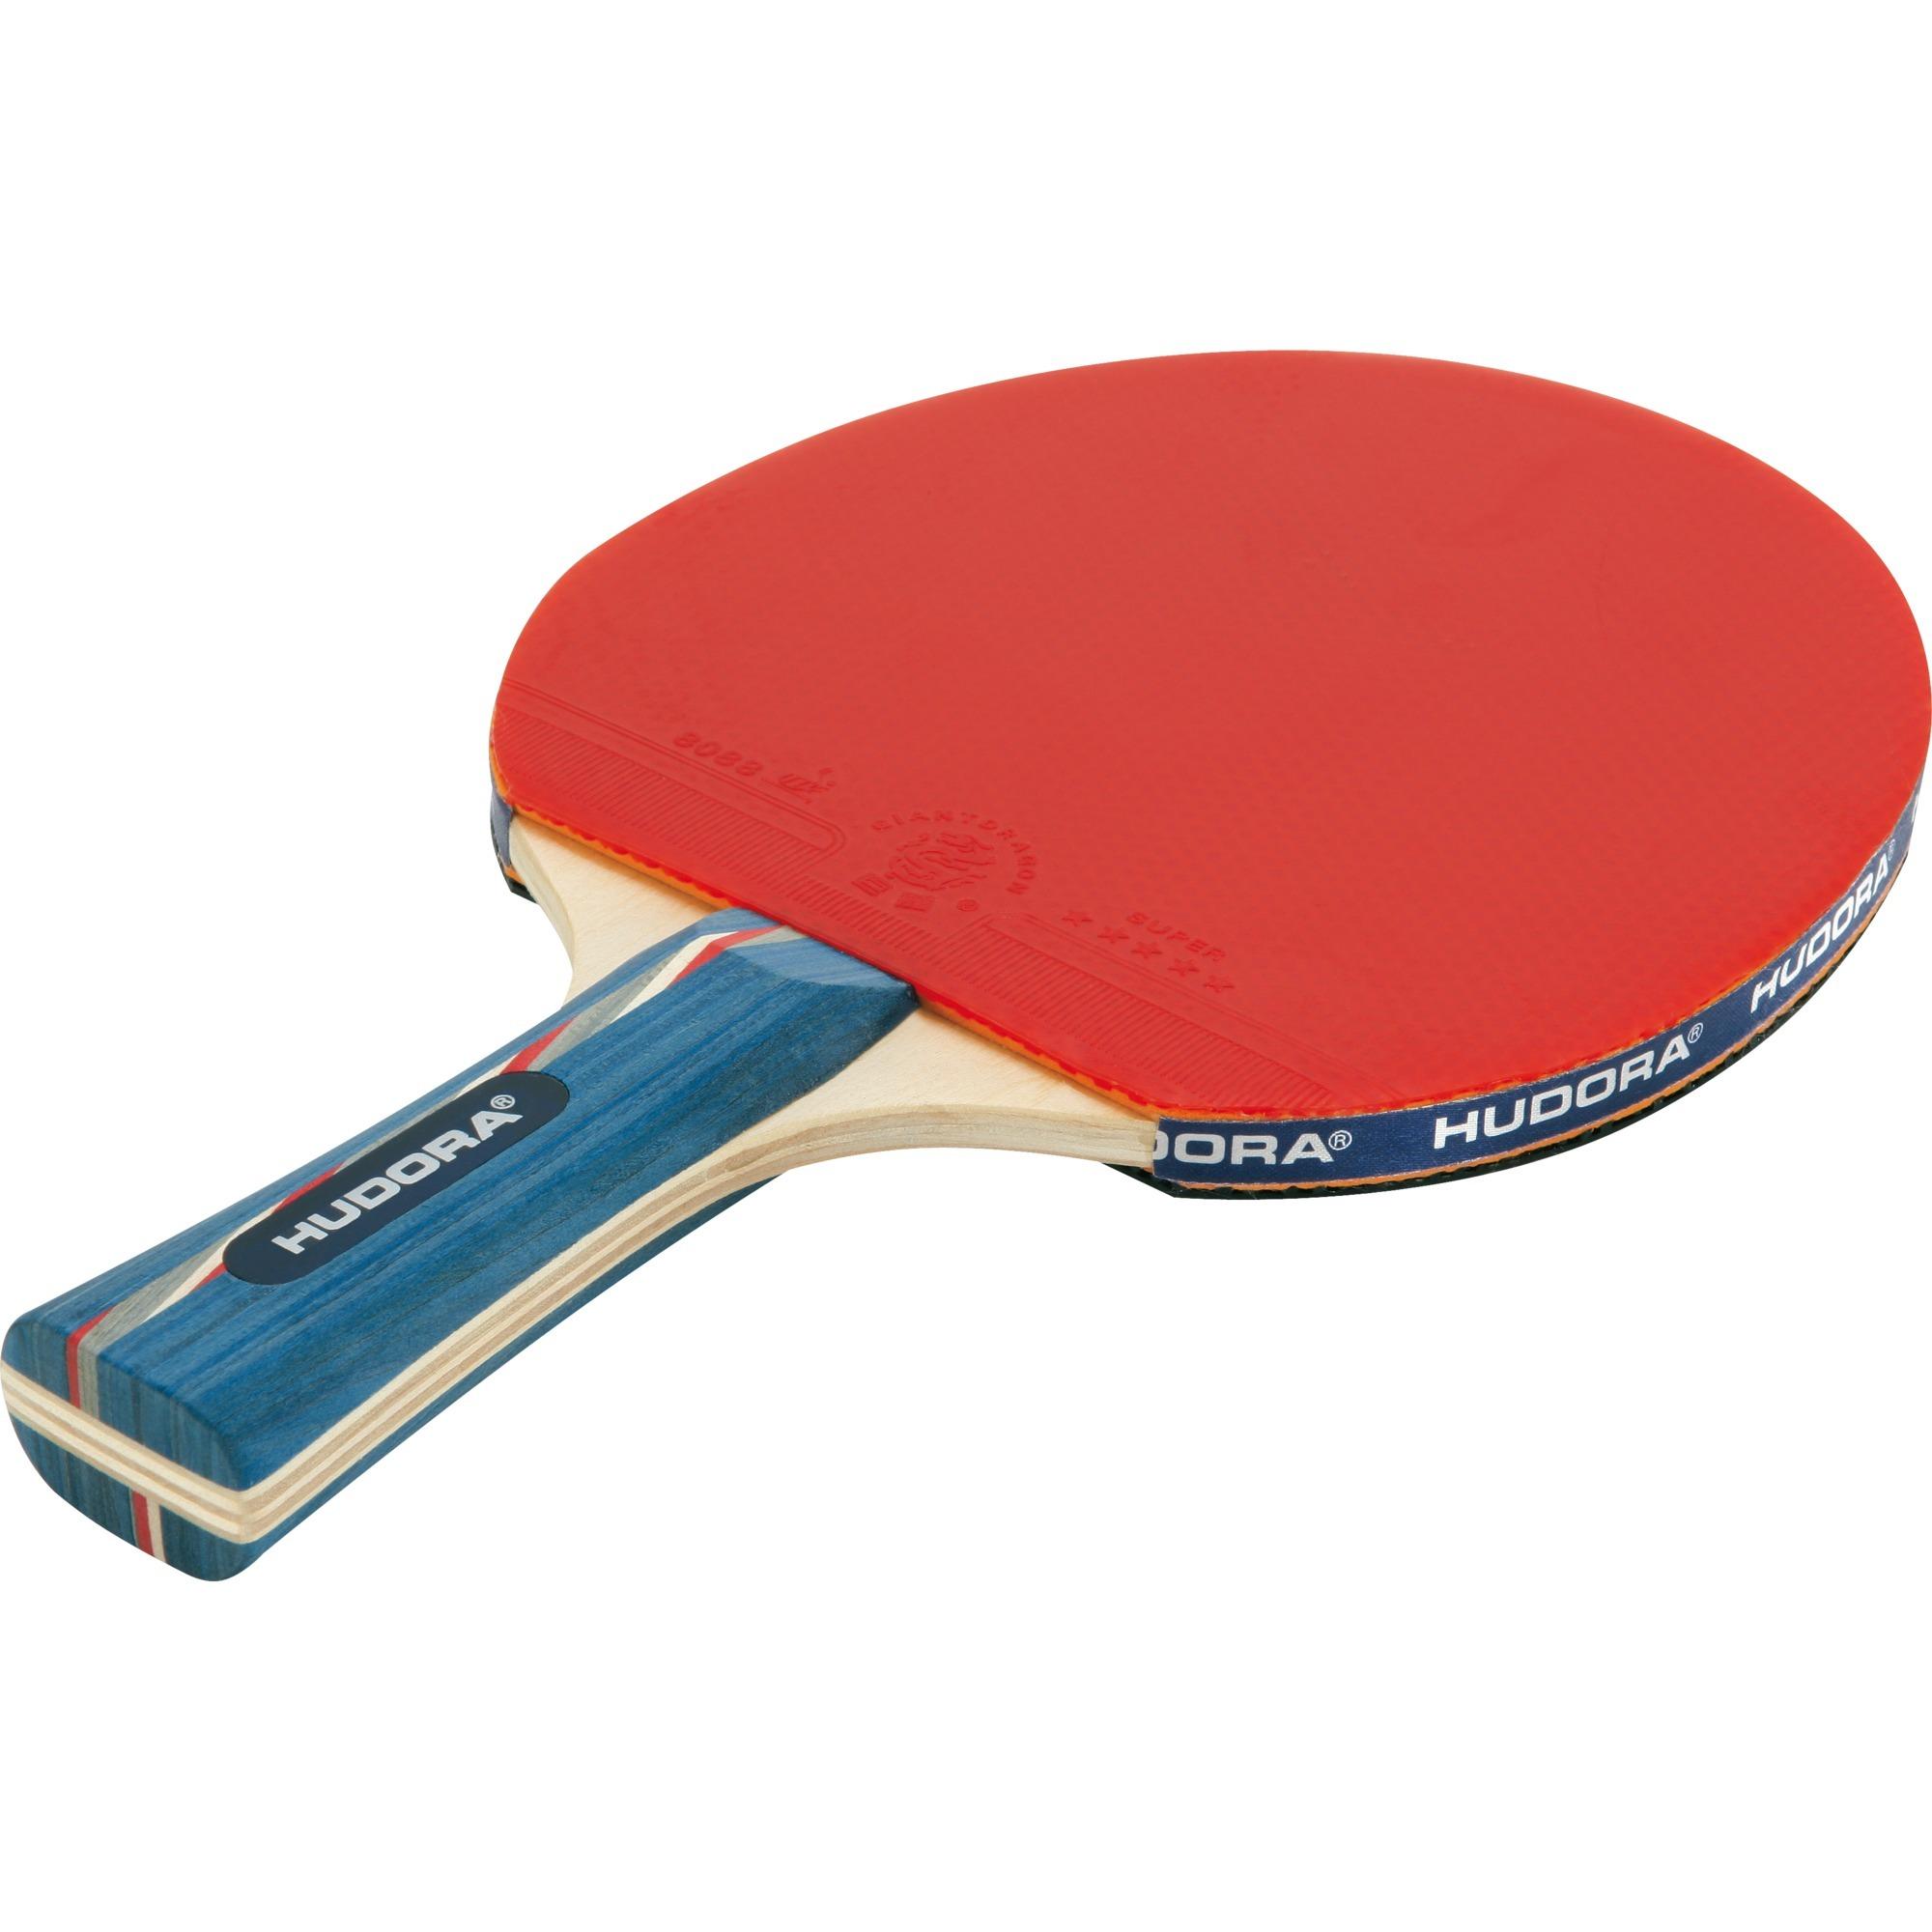 76266 raqueta para tenis de mesa Azul, Rojo Espuma, Madera 1 pieza(s), Aparato para fitness